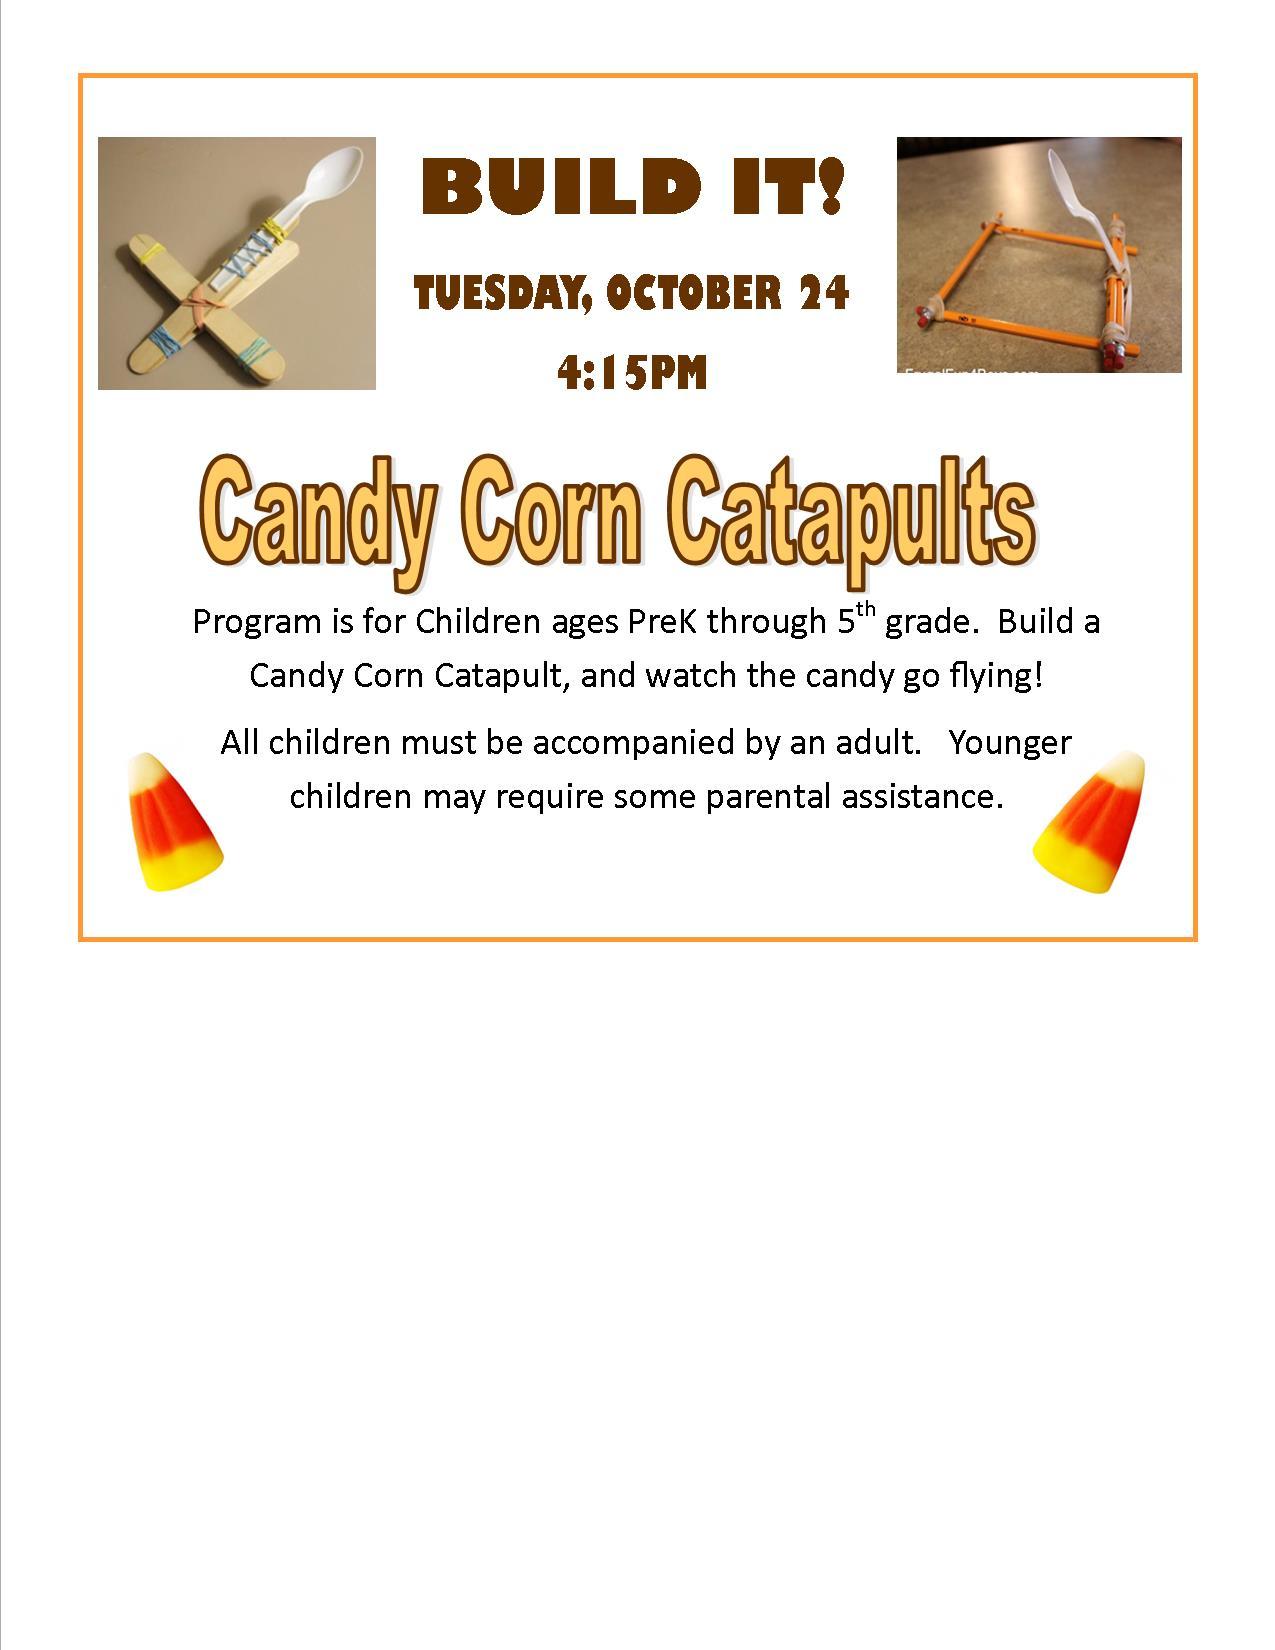 csndy corn catapults.jpg